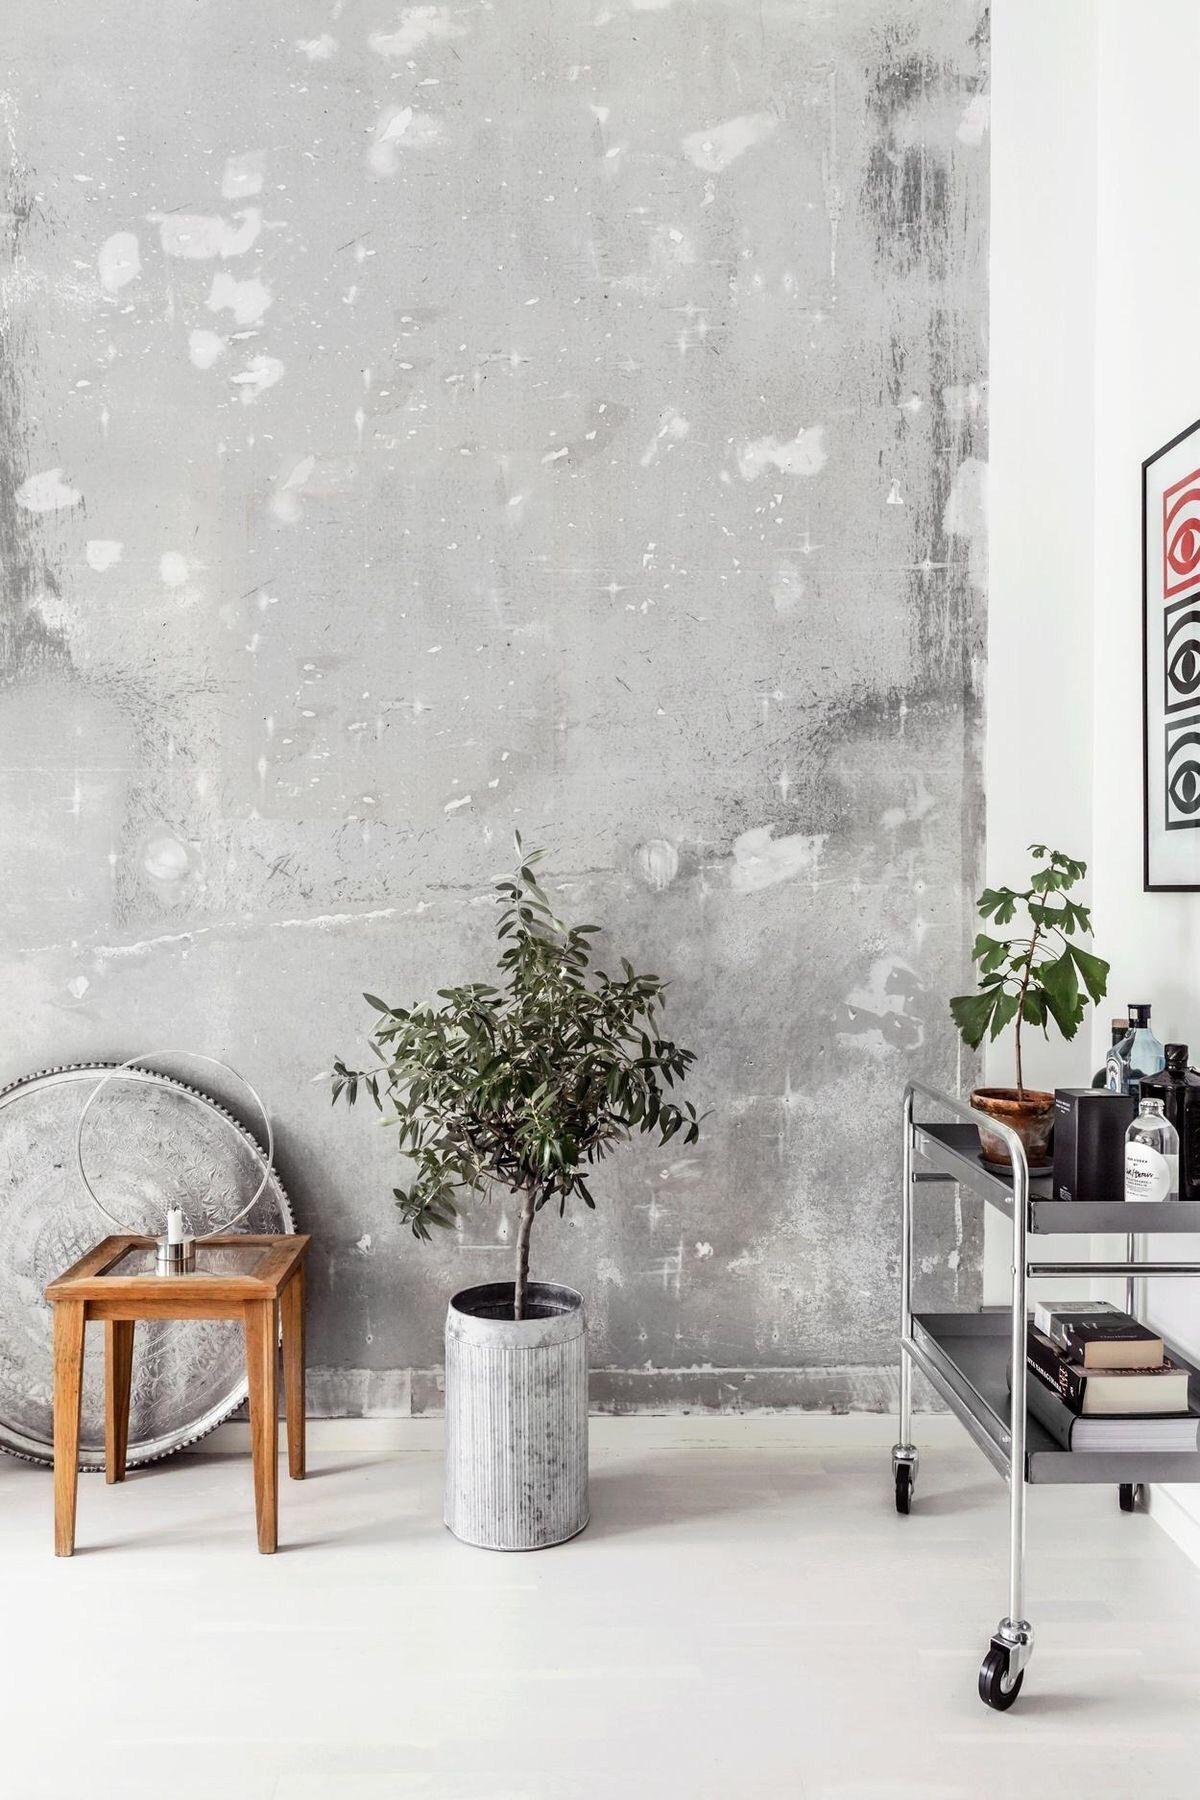 Interior Trends Wabi Sabi Decor And The Top Interior Wall Finishes For 2018 Concrete Walls Interior Trending Decor Interior Walls